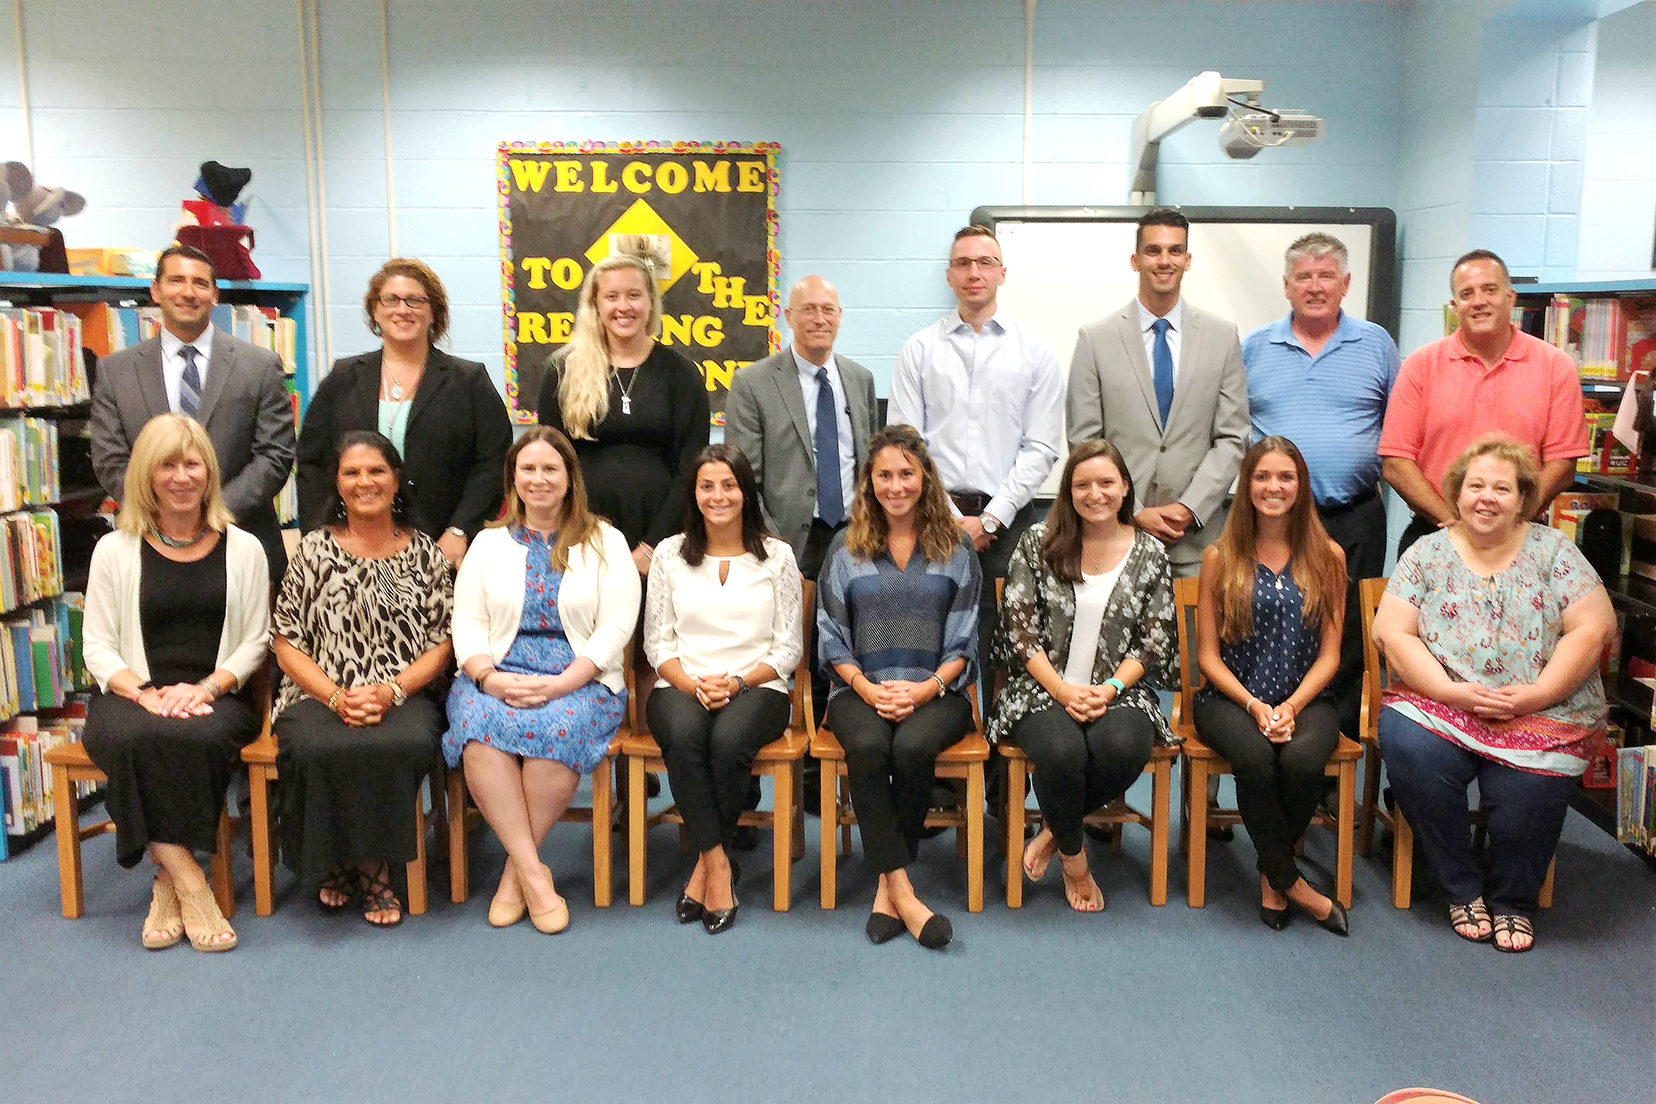 2 new STEM teachers join Secaucus Middle School staff   NJ.com